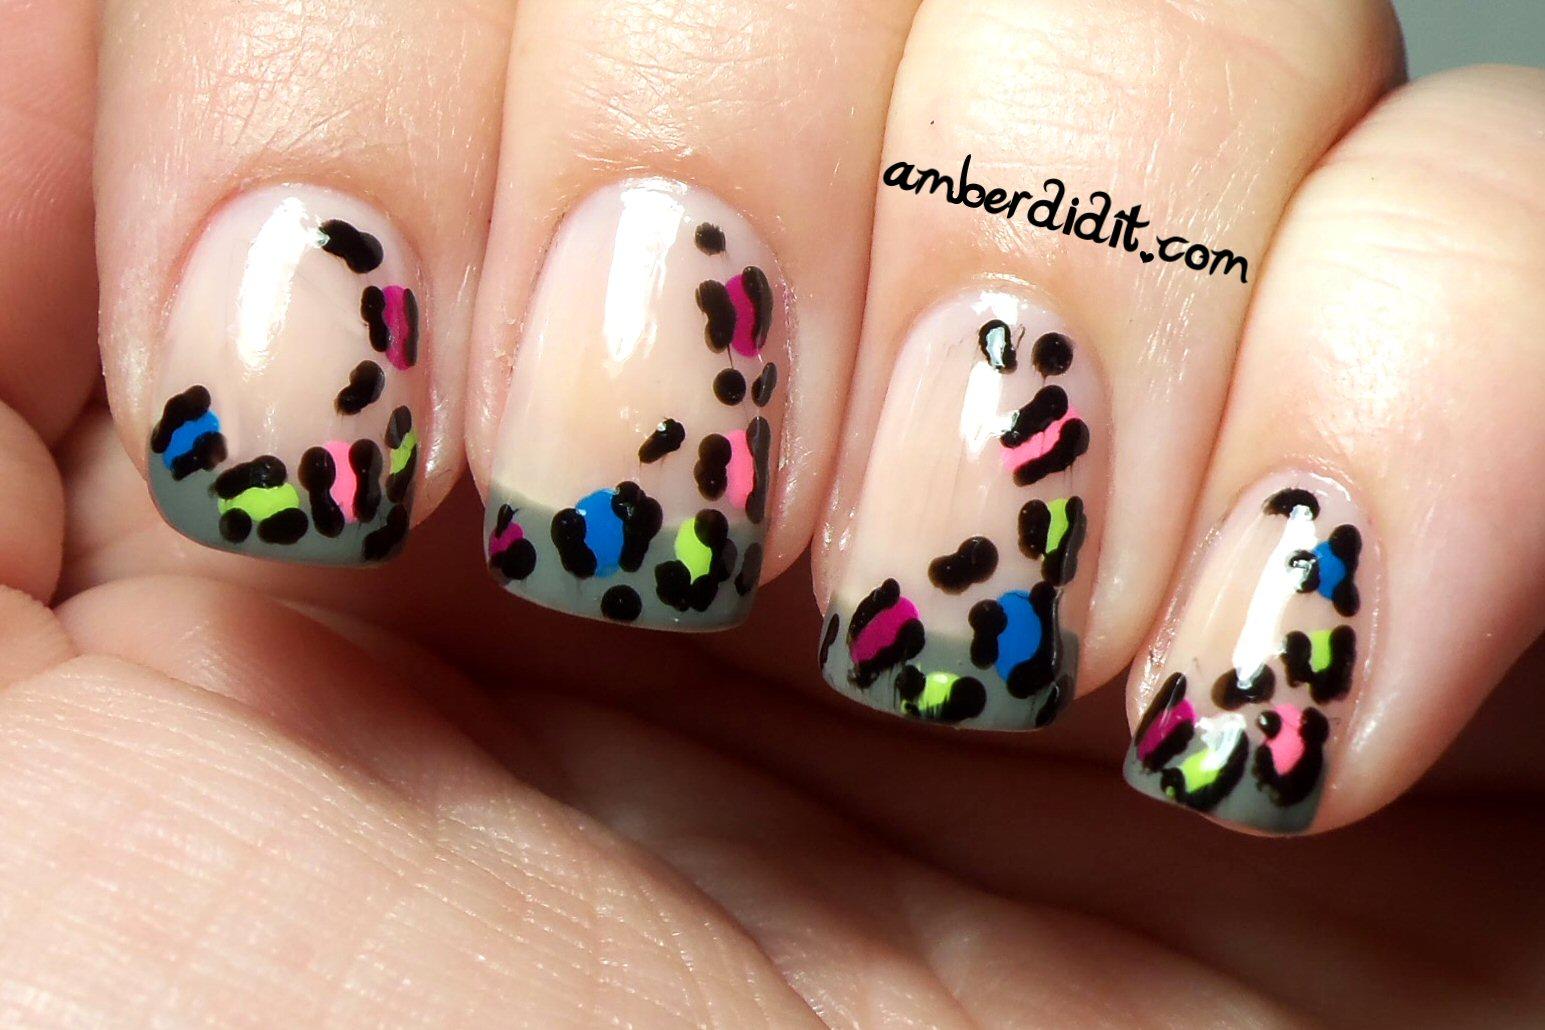 Rebecca Likes Nails 2015 | Personal Blog